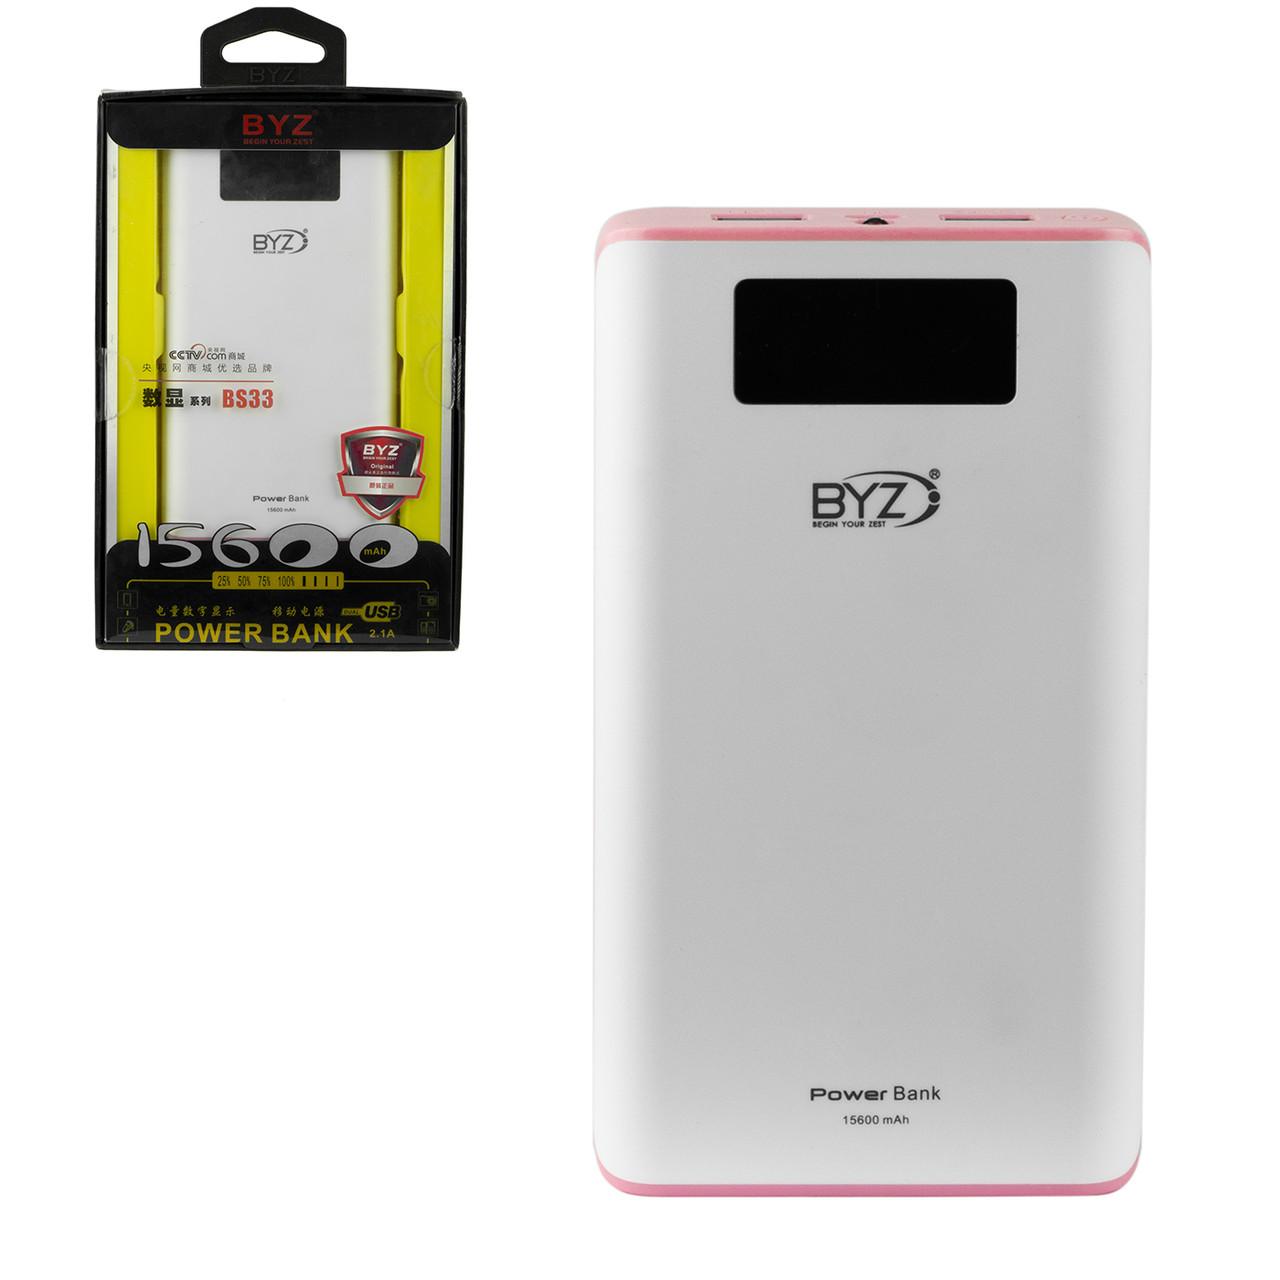 Power bank BYZ BS33 15600mAh 2XUSB White